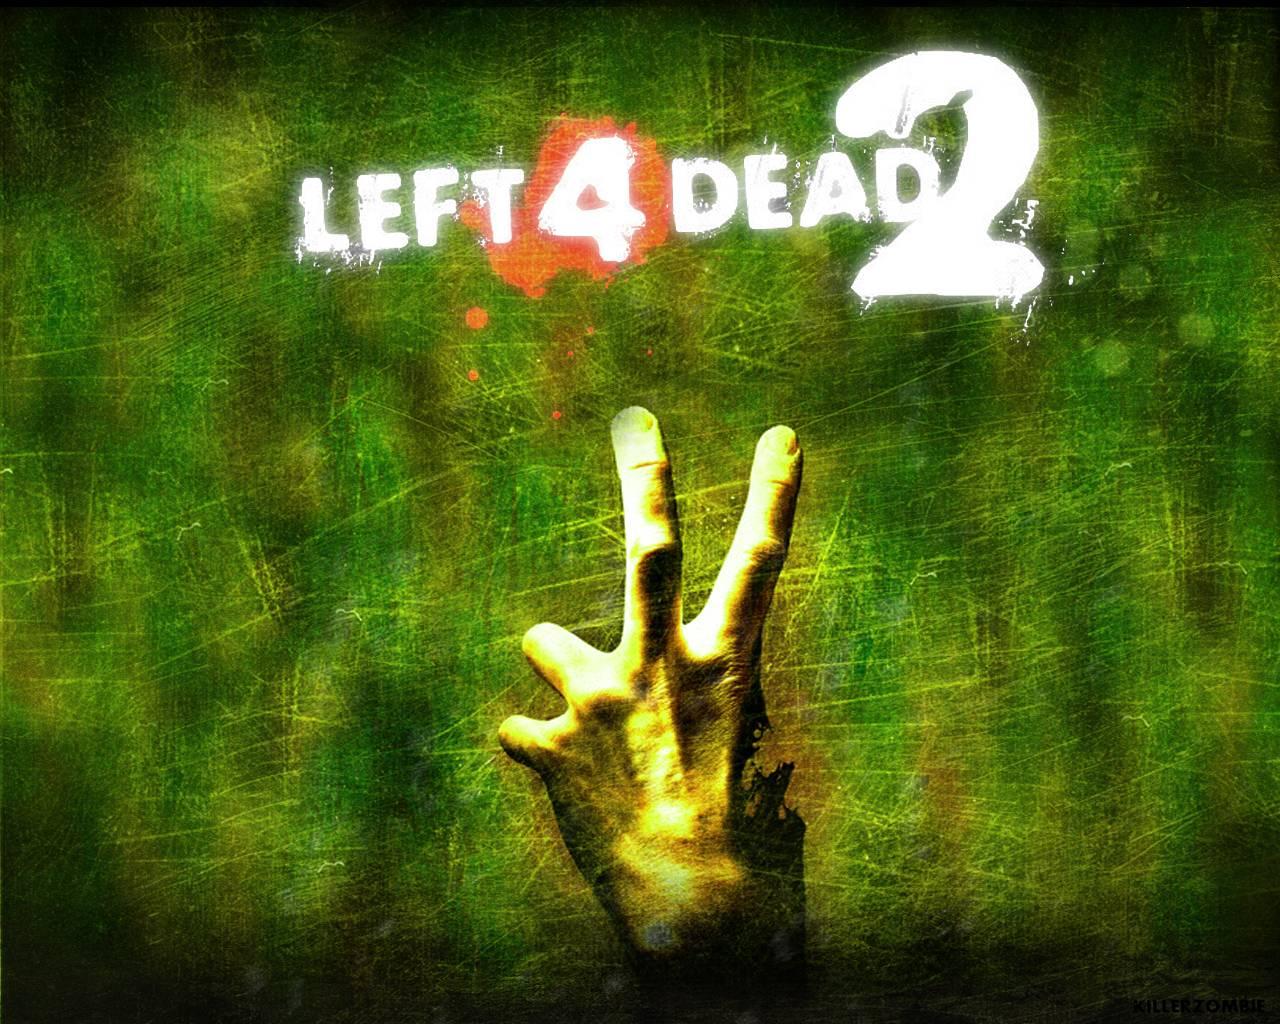 Left 4 Dead 2 Wallpapers - Wallpaper Cave